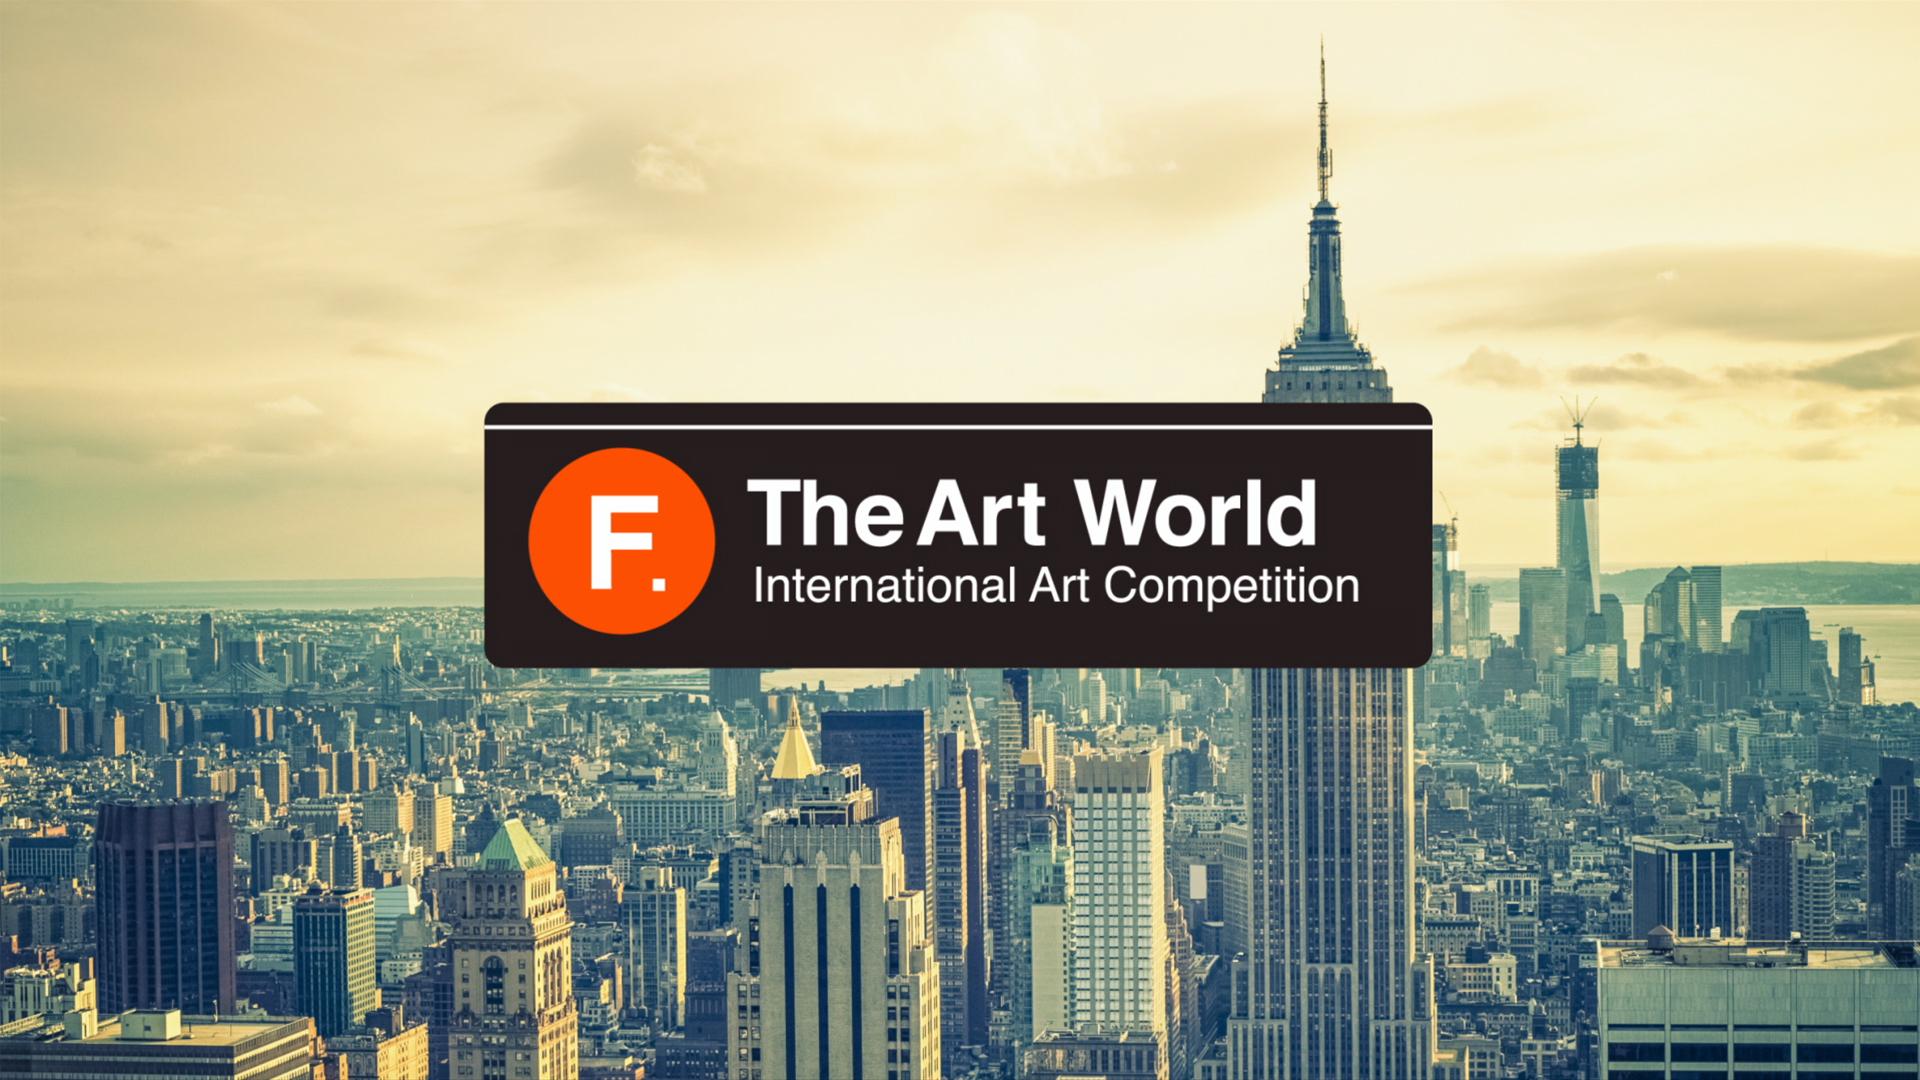 F The Art World – International Art Competiton